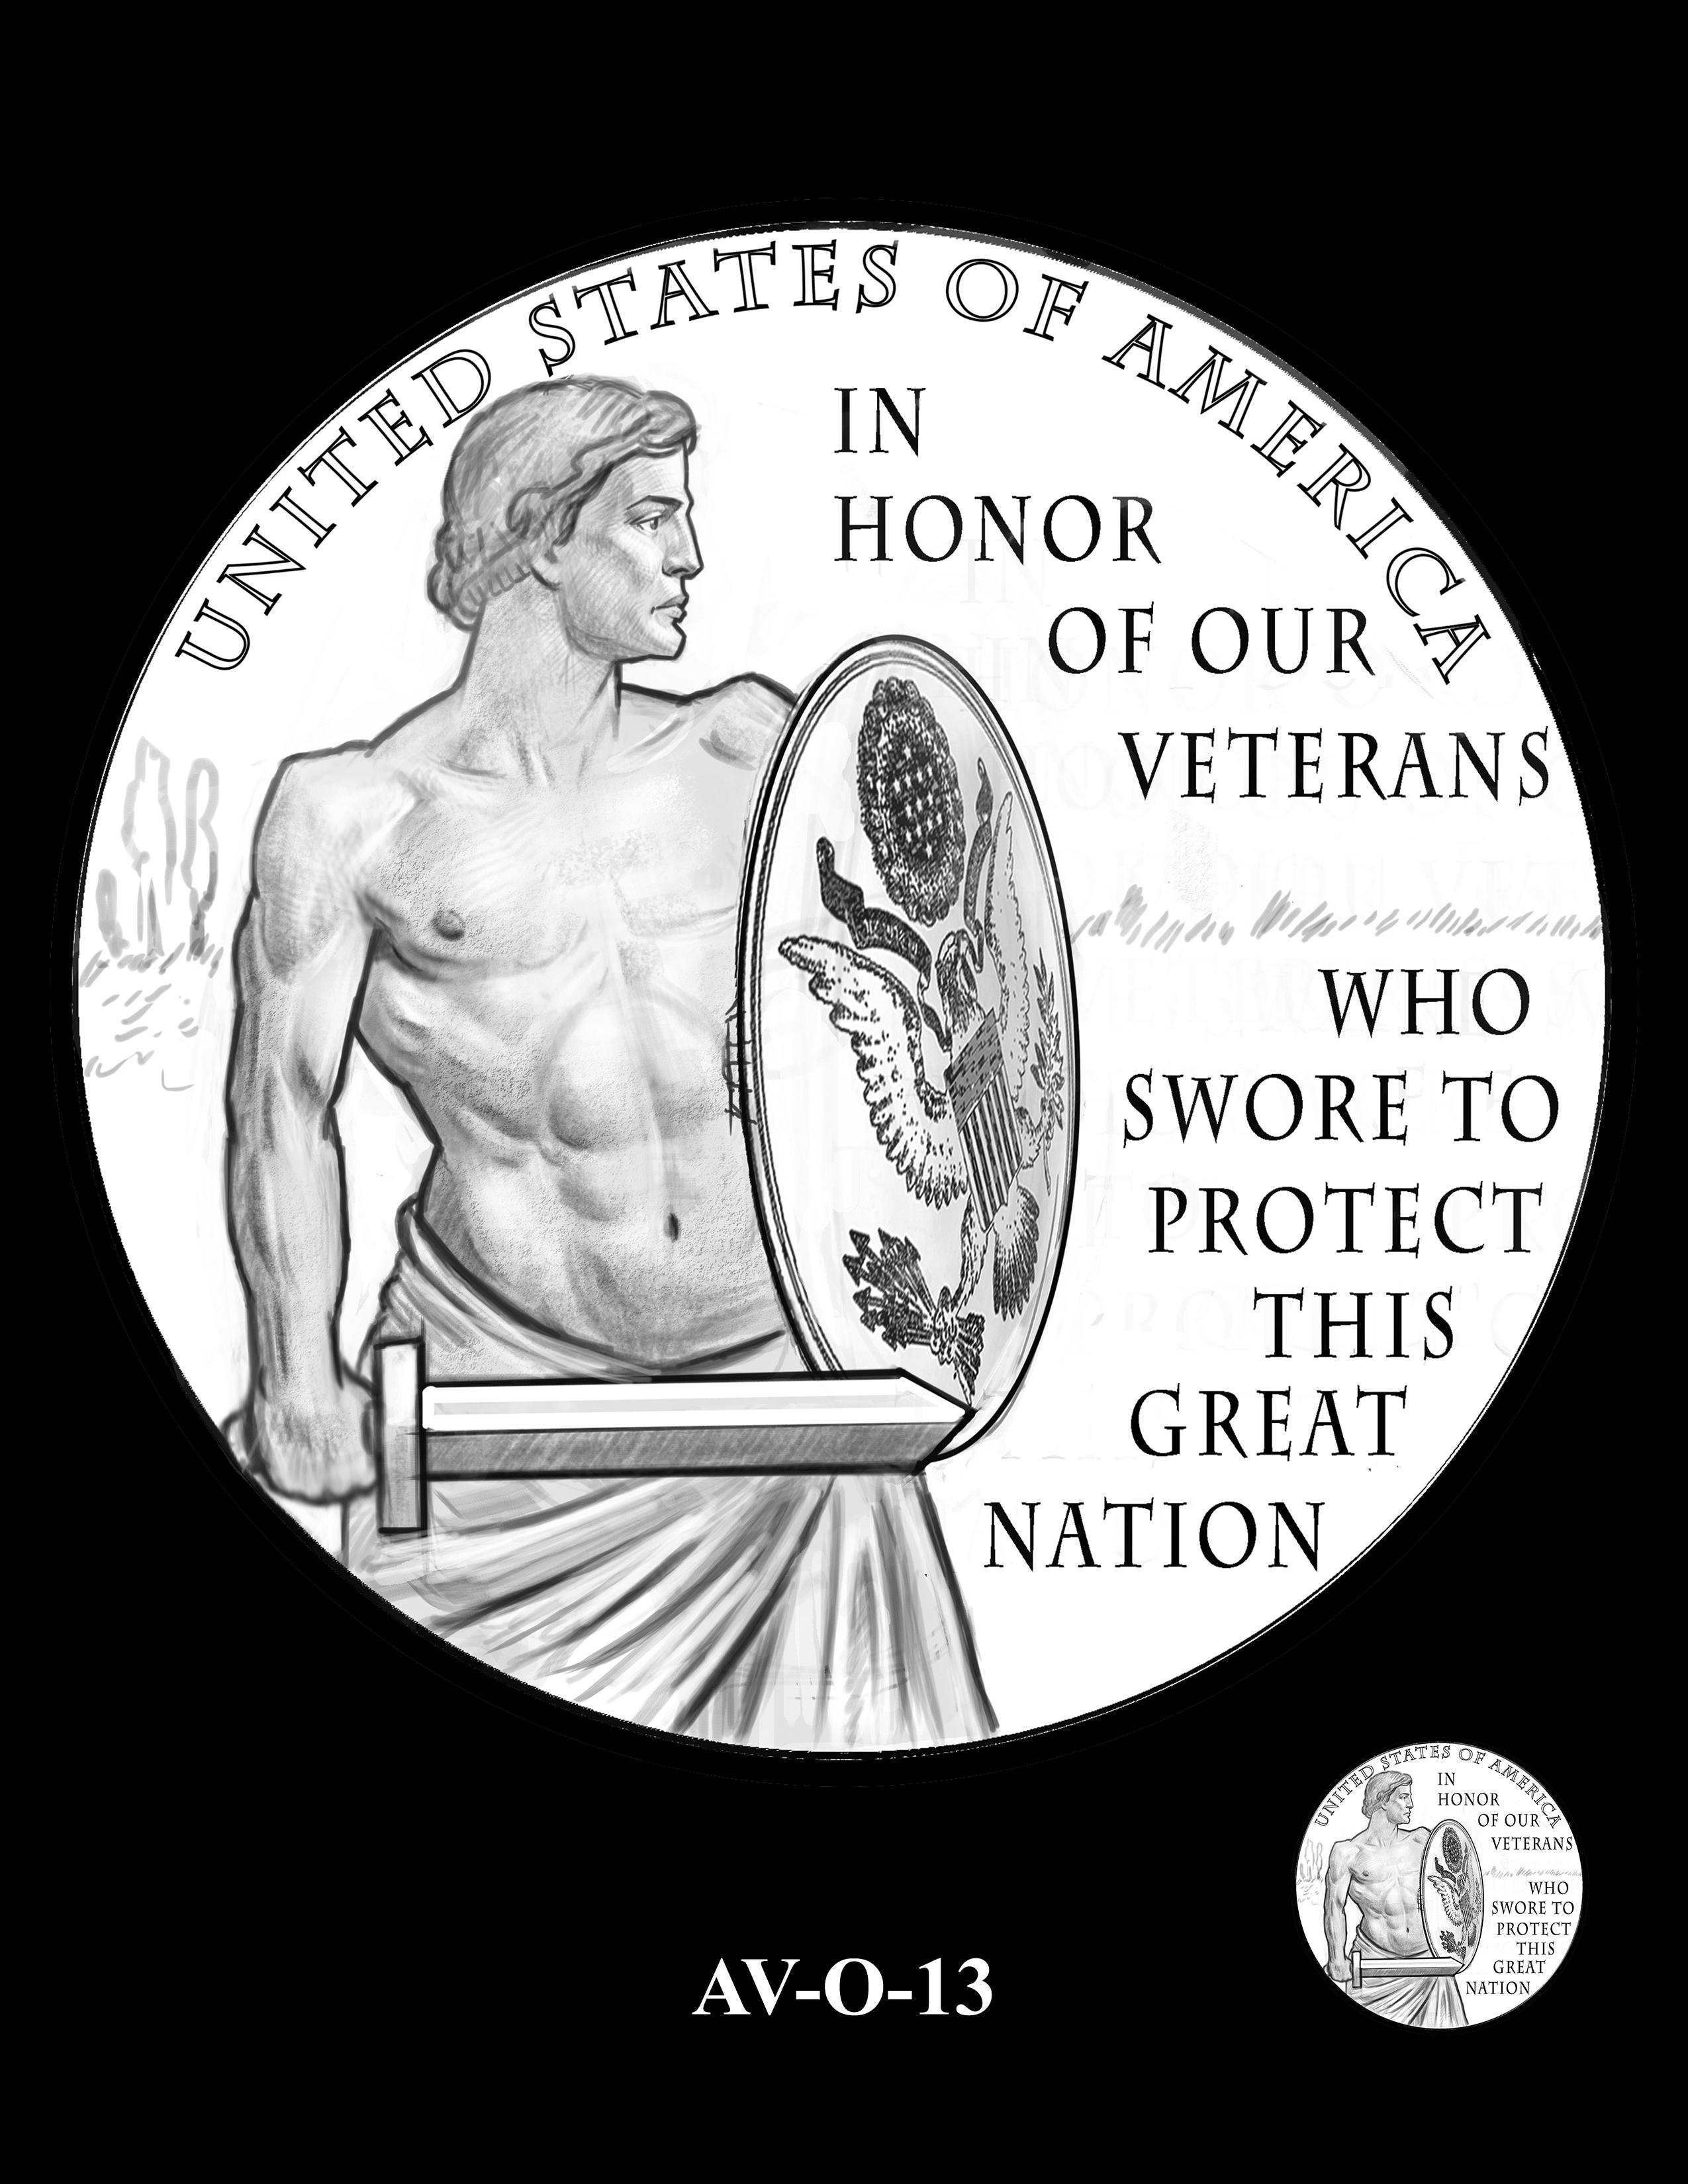 AV-O-13 - American Veterans Medal